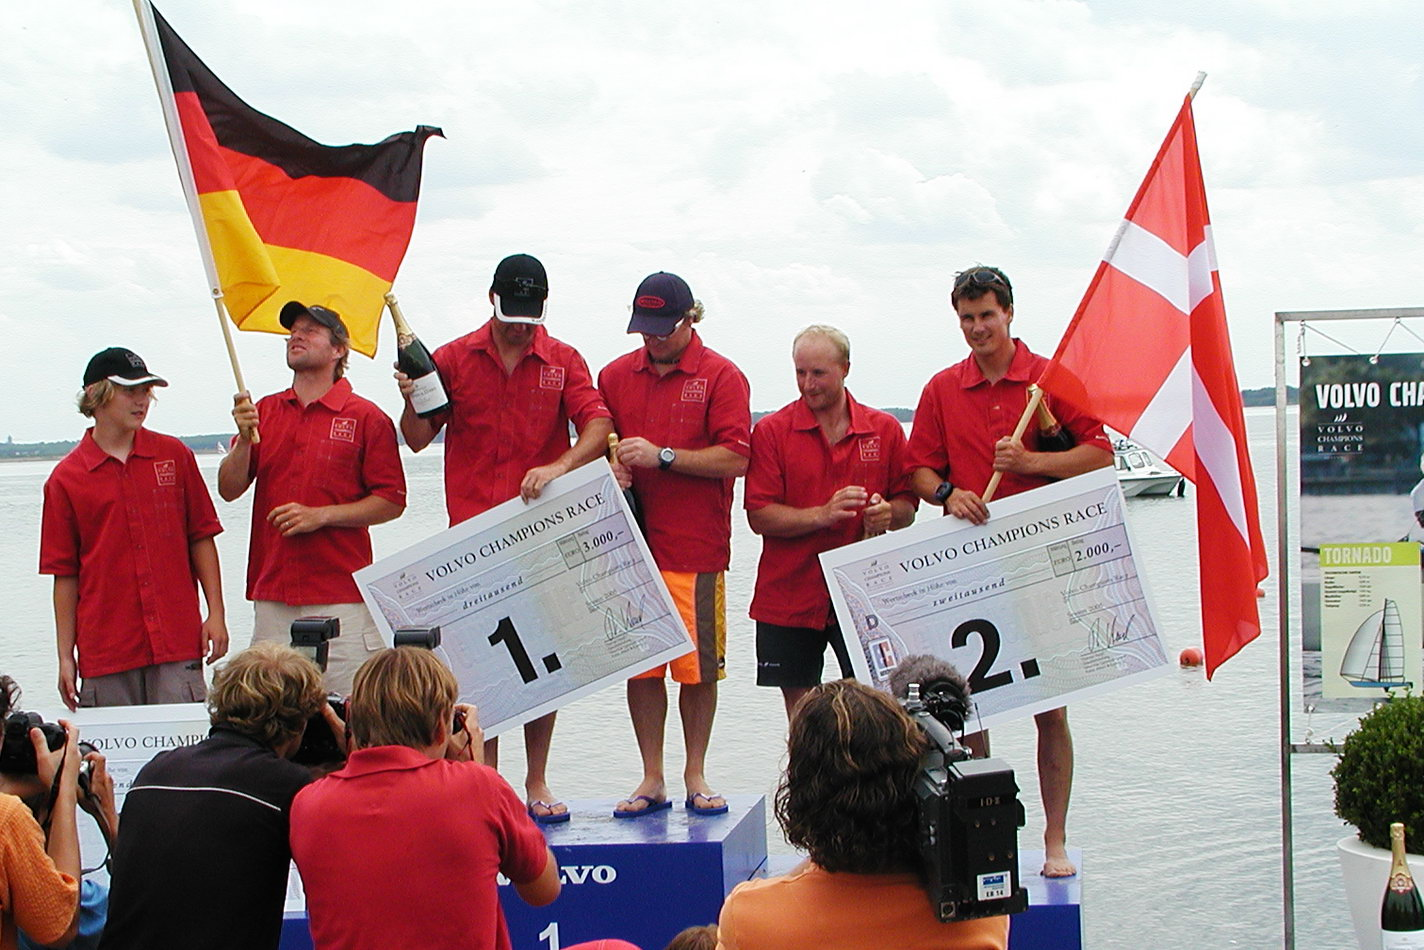 Volvo-Champions-Race